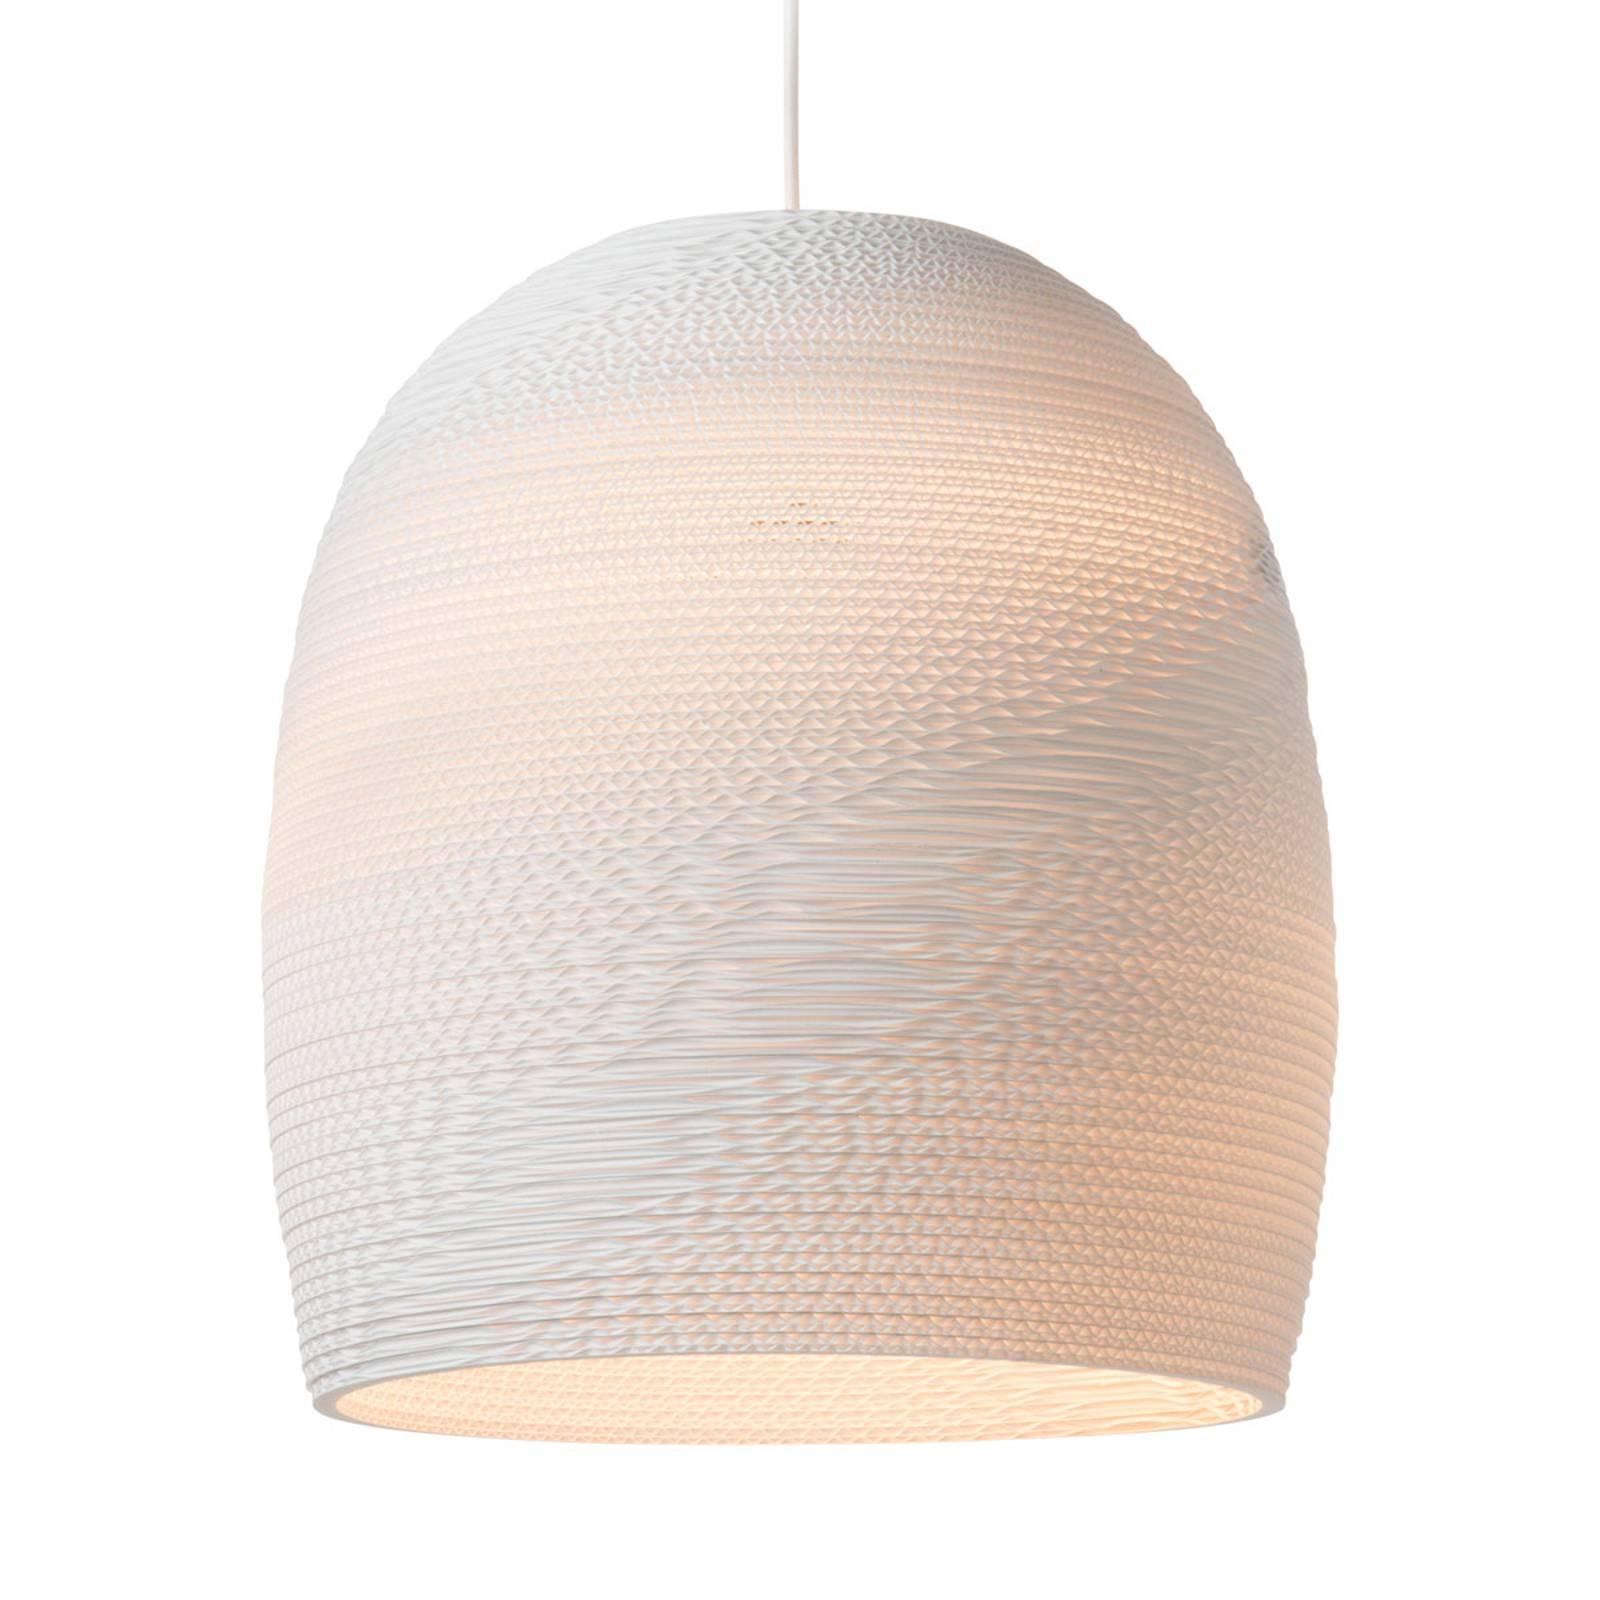 Lampa wisząca Bell biała Ø 38 cm